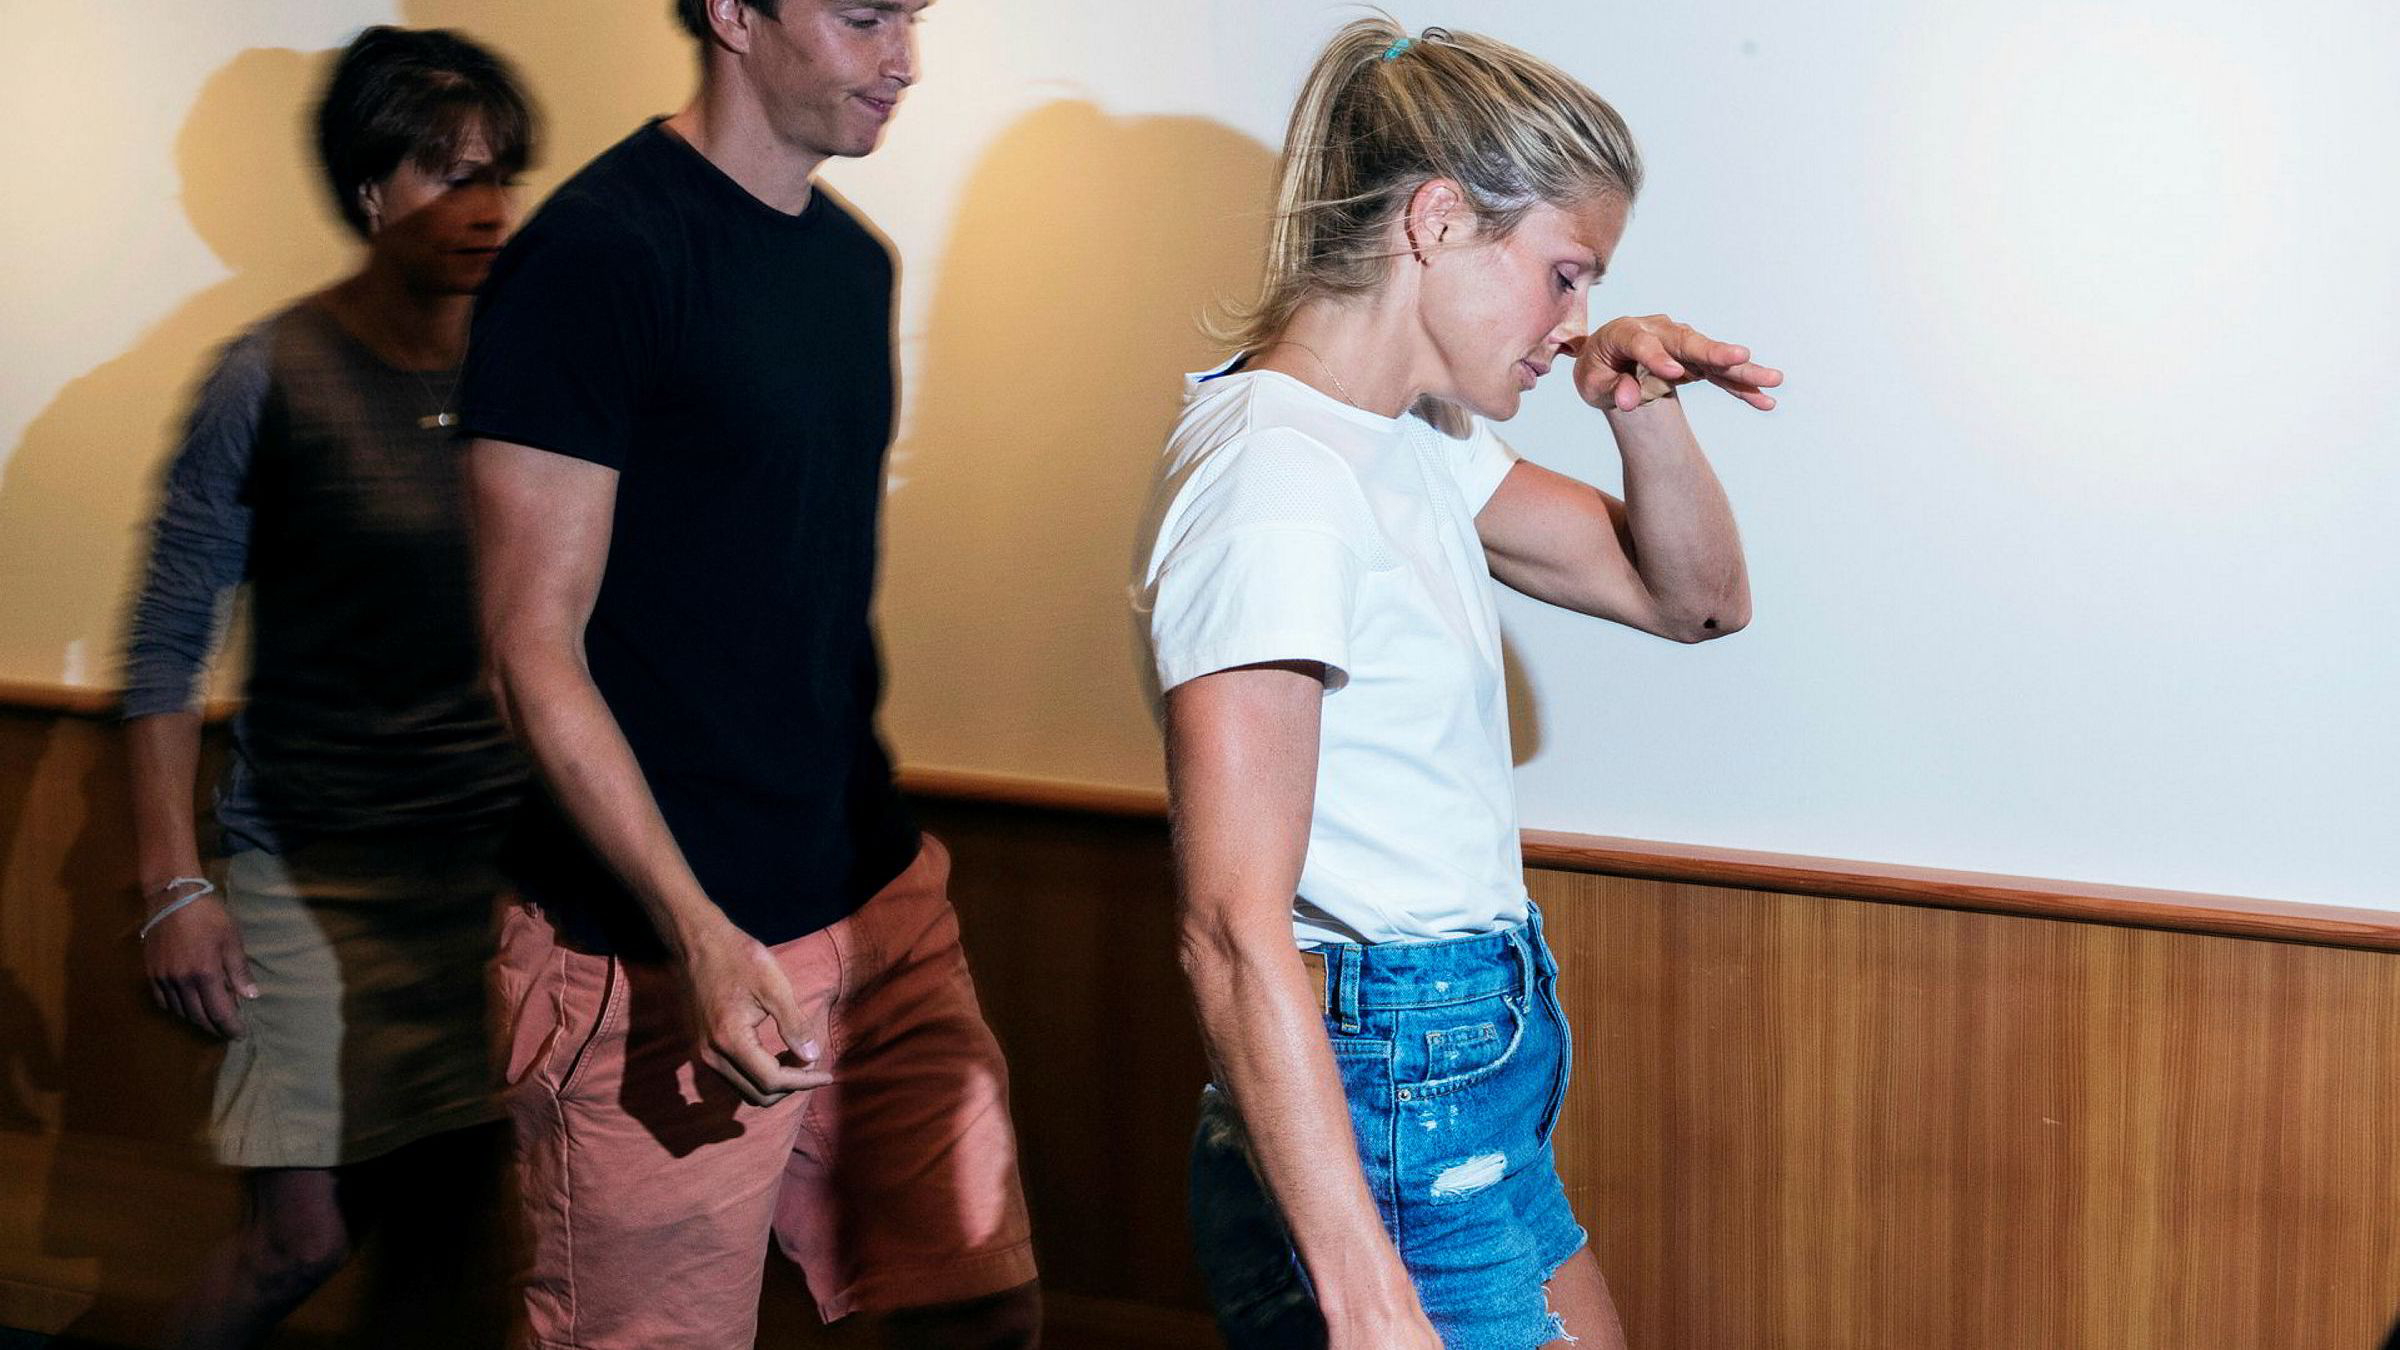 Therese Johaug har ventet på dom i Cas siden høringen i Sveits i starten av juni. Hun ble først informert om den positive dopingprøven i starten av oktober 2016. Her under pressekonferansen tirsdag.